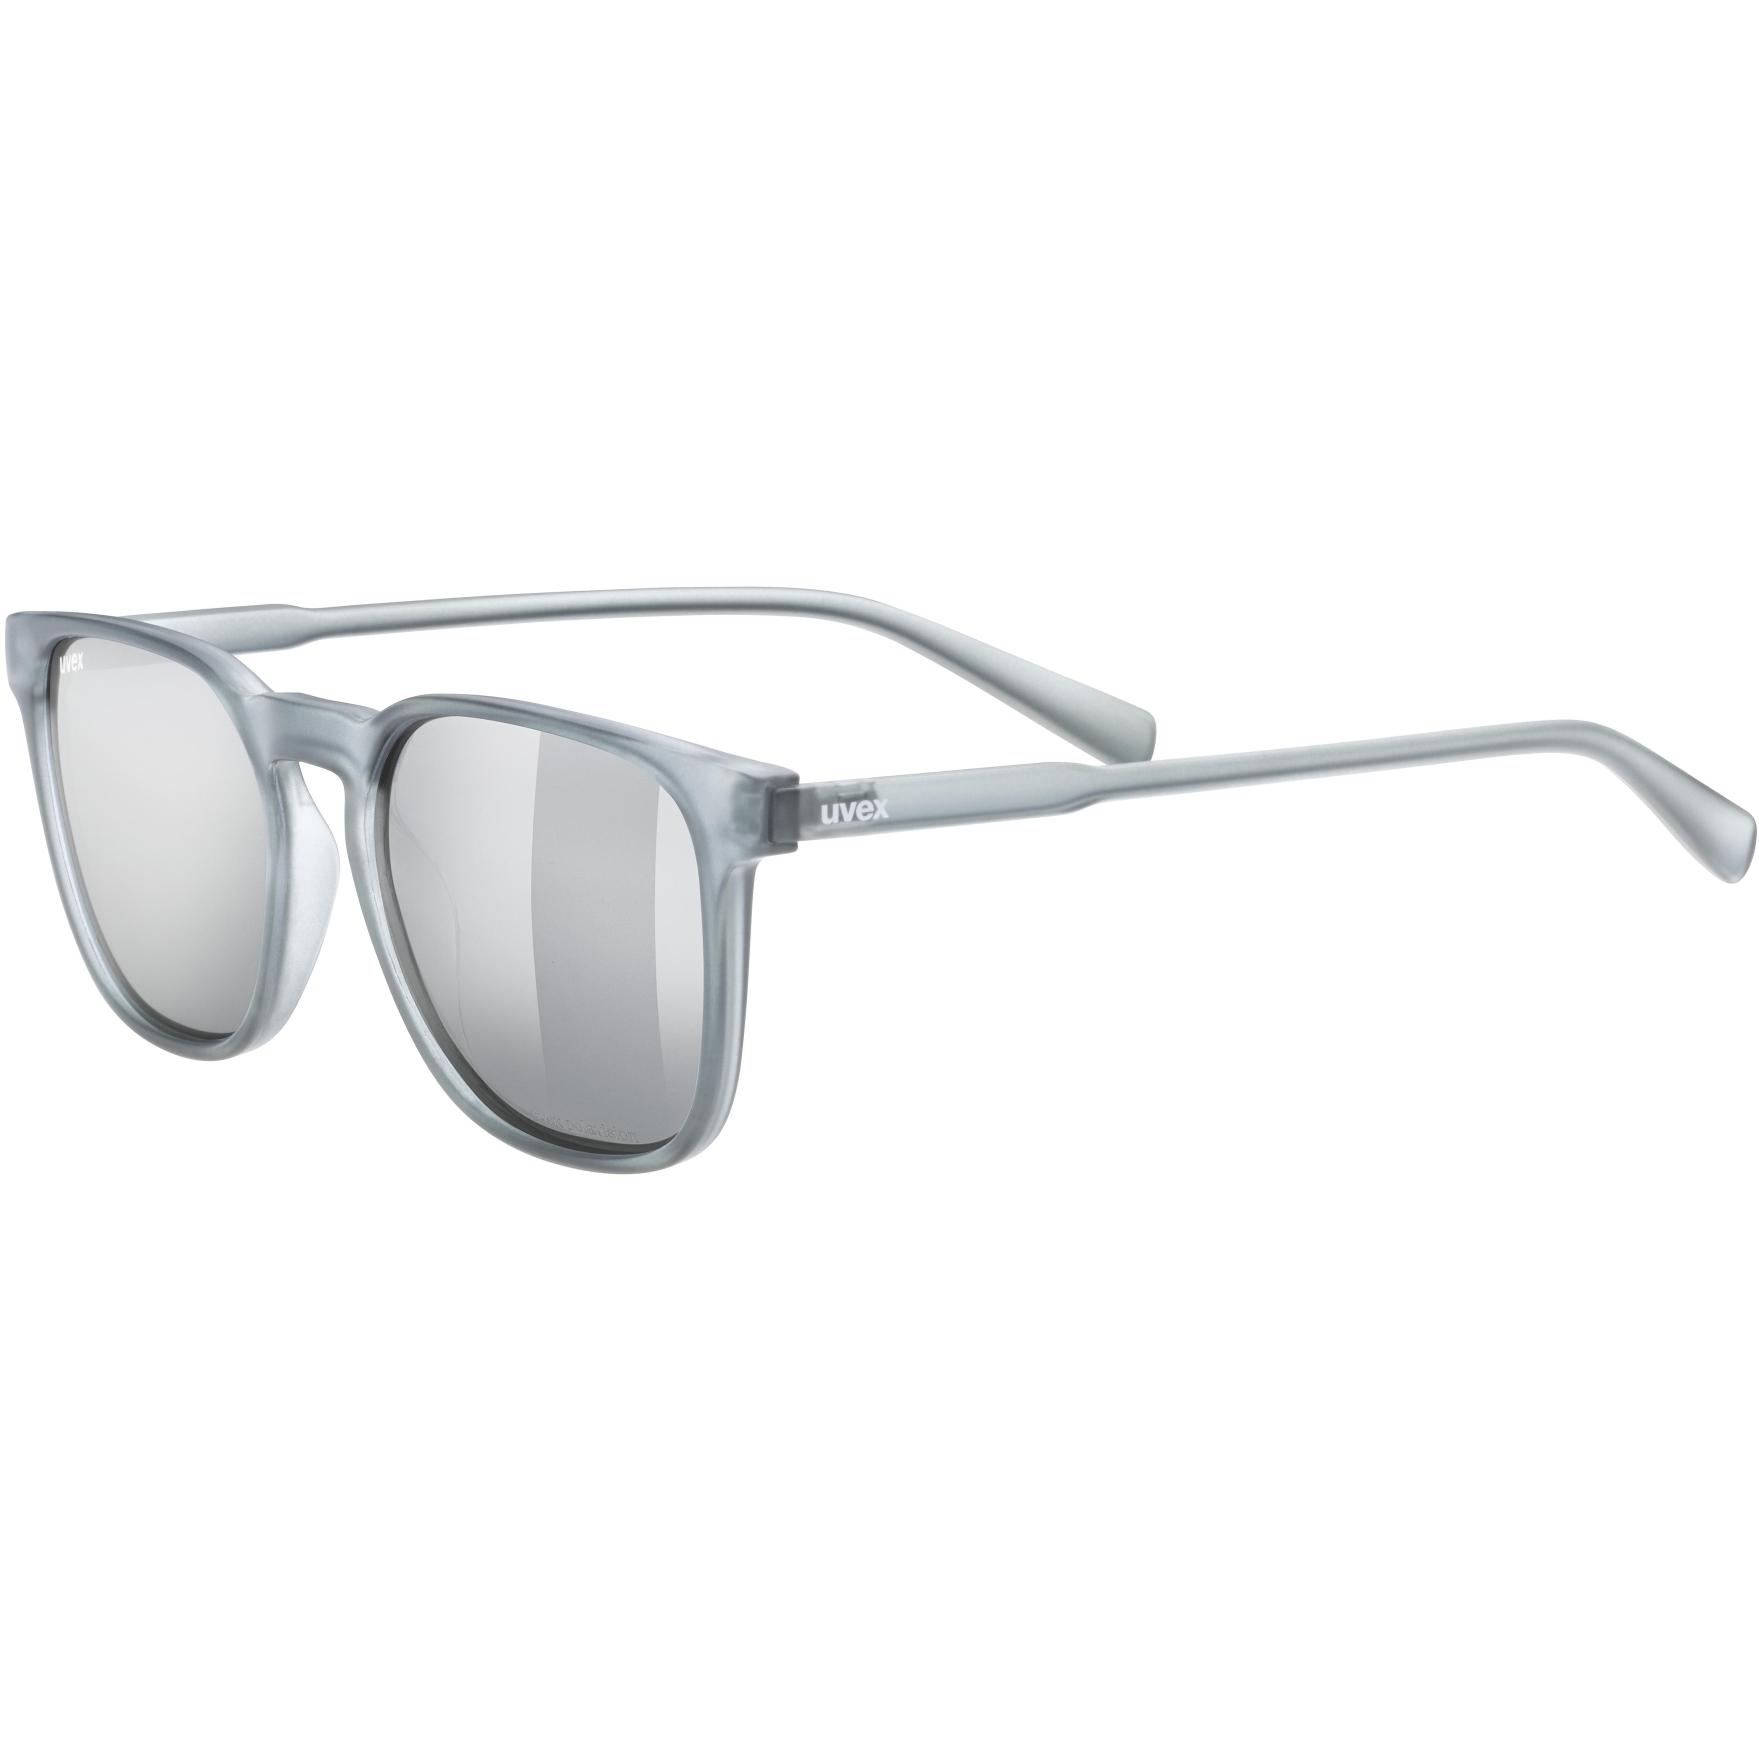 Uvex lgl 49 P Brille - smoke mat/polavision mirror silver